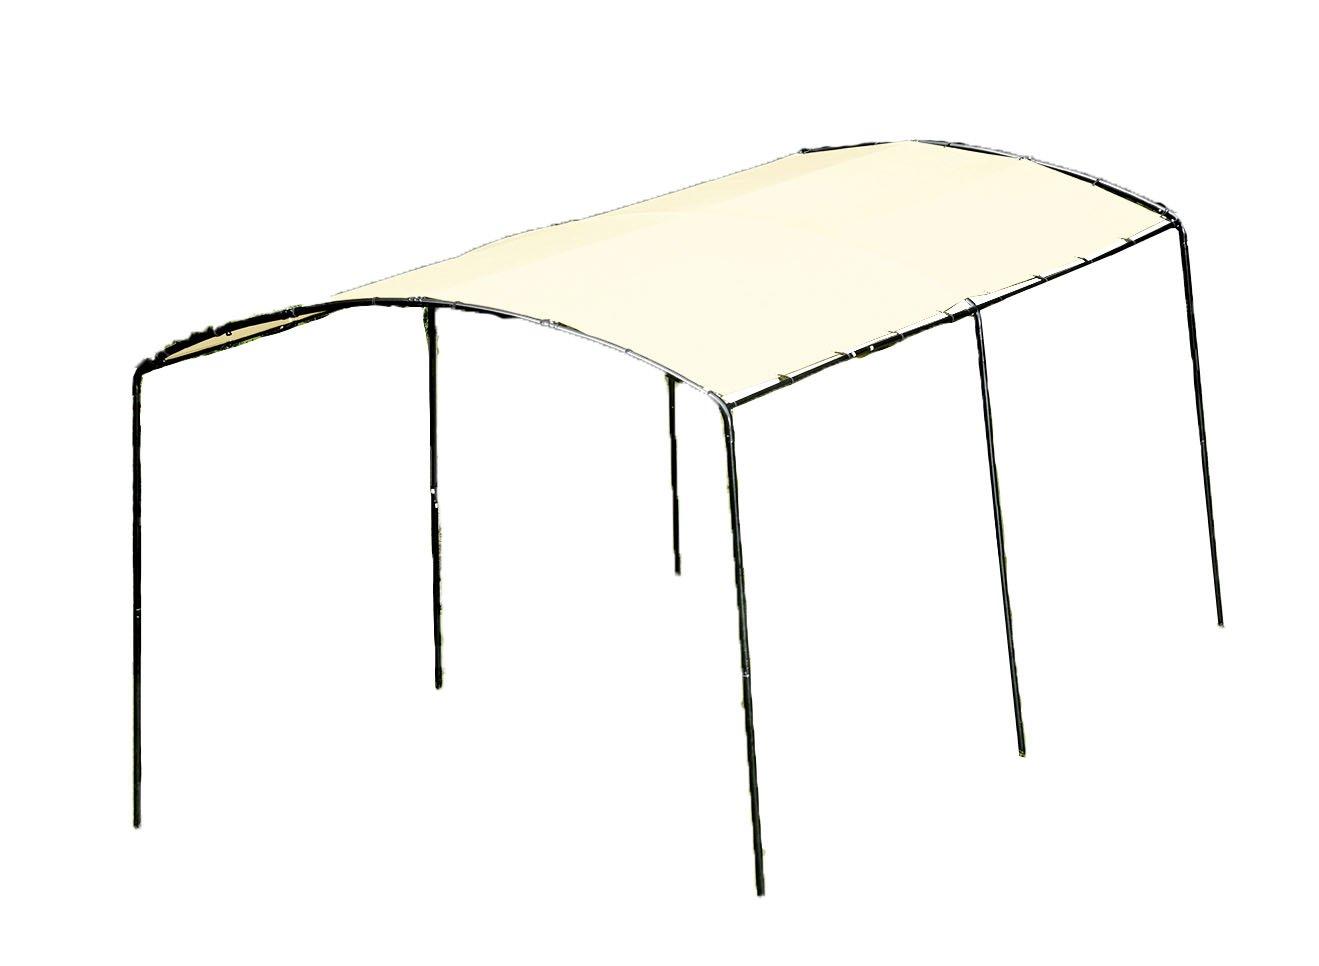 ShelterLogic Monarc Canopy, Sandstone, 10 x 18 ft.